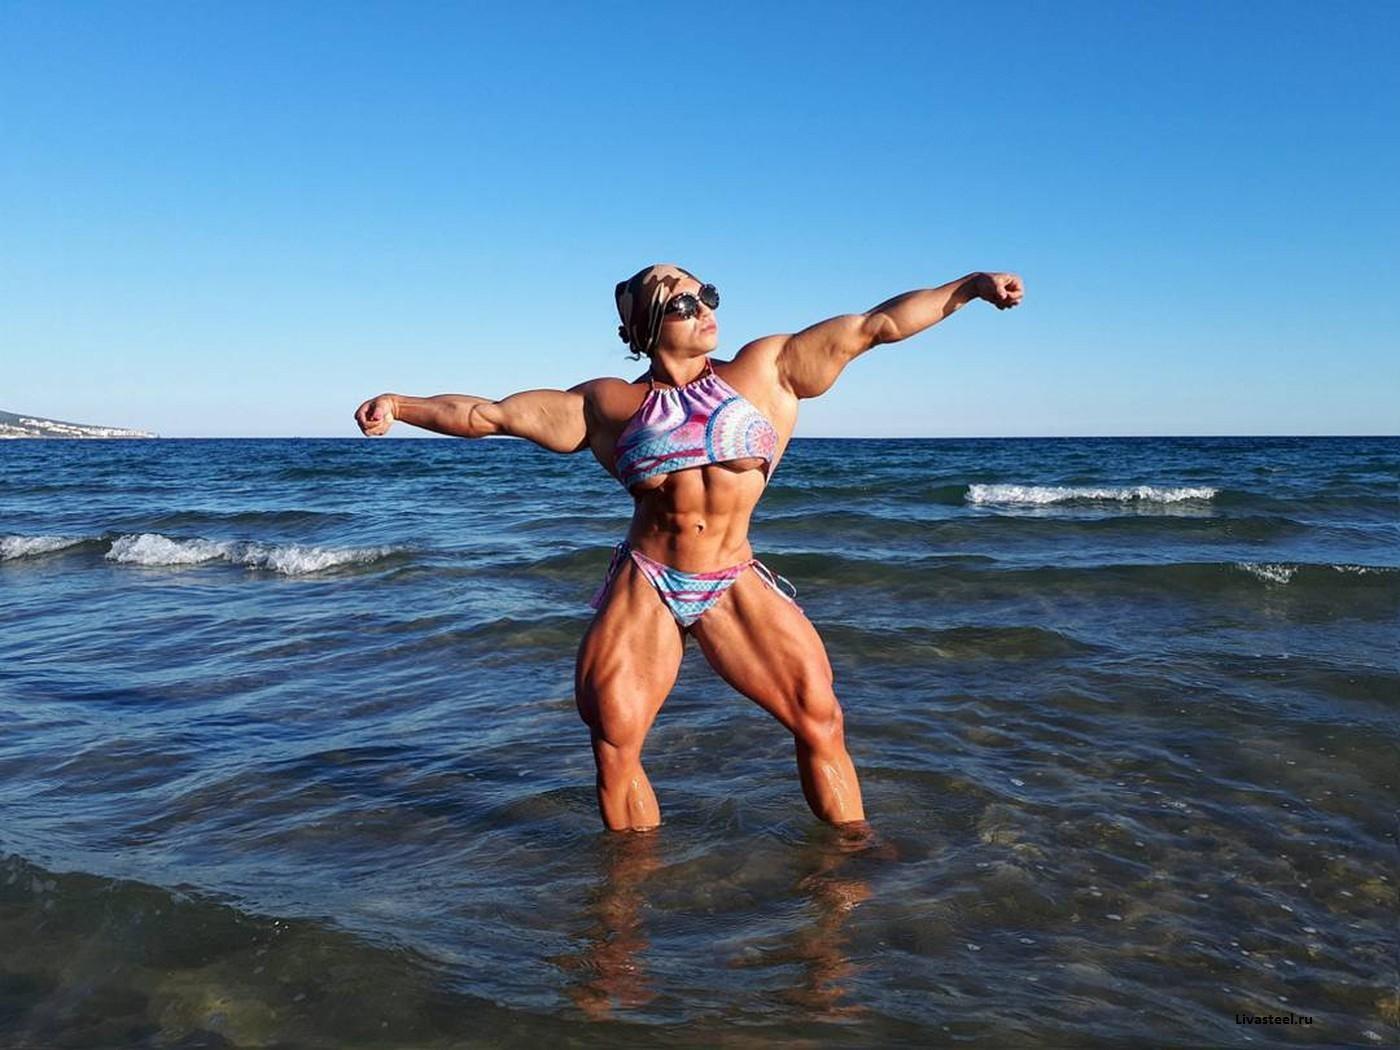 Наталия амазонка кузнецова трухина - сама большая бодибилдерша планеты | фитнес тренер юрий спасокукоцкий | яндекс дзен